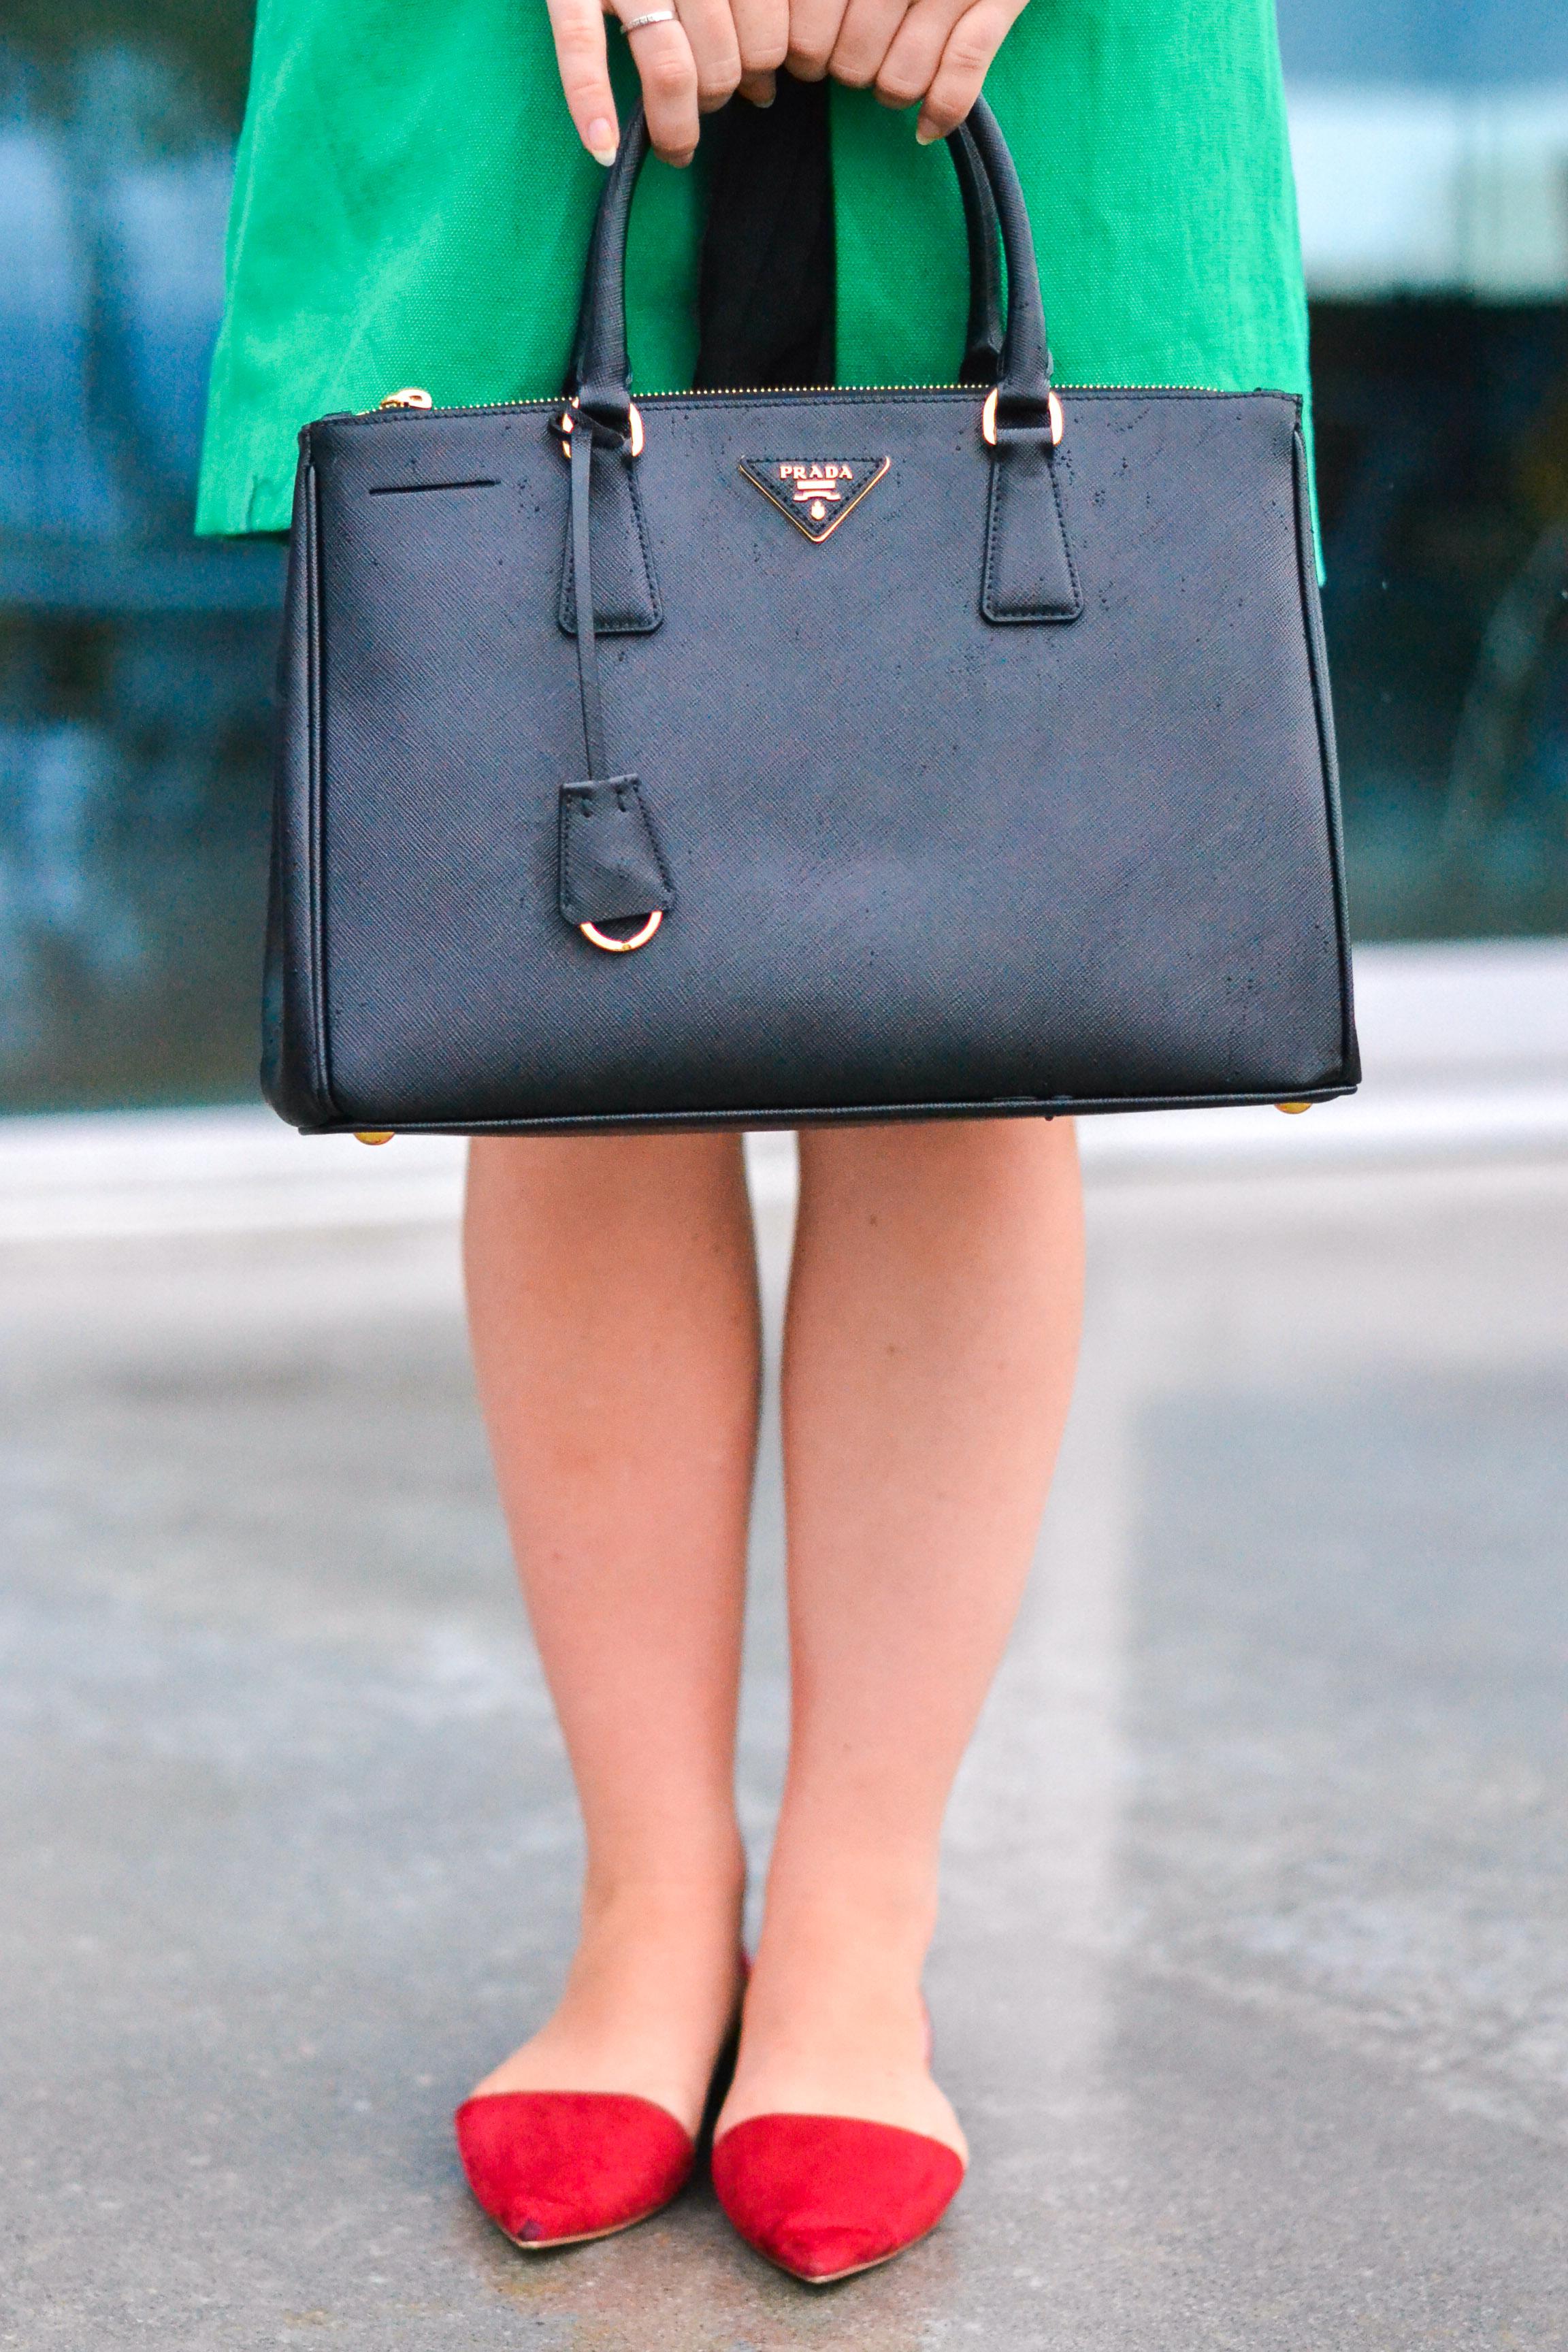 prada nylon baby bag - Prada Saffiano Lux Tote \u2013